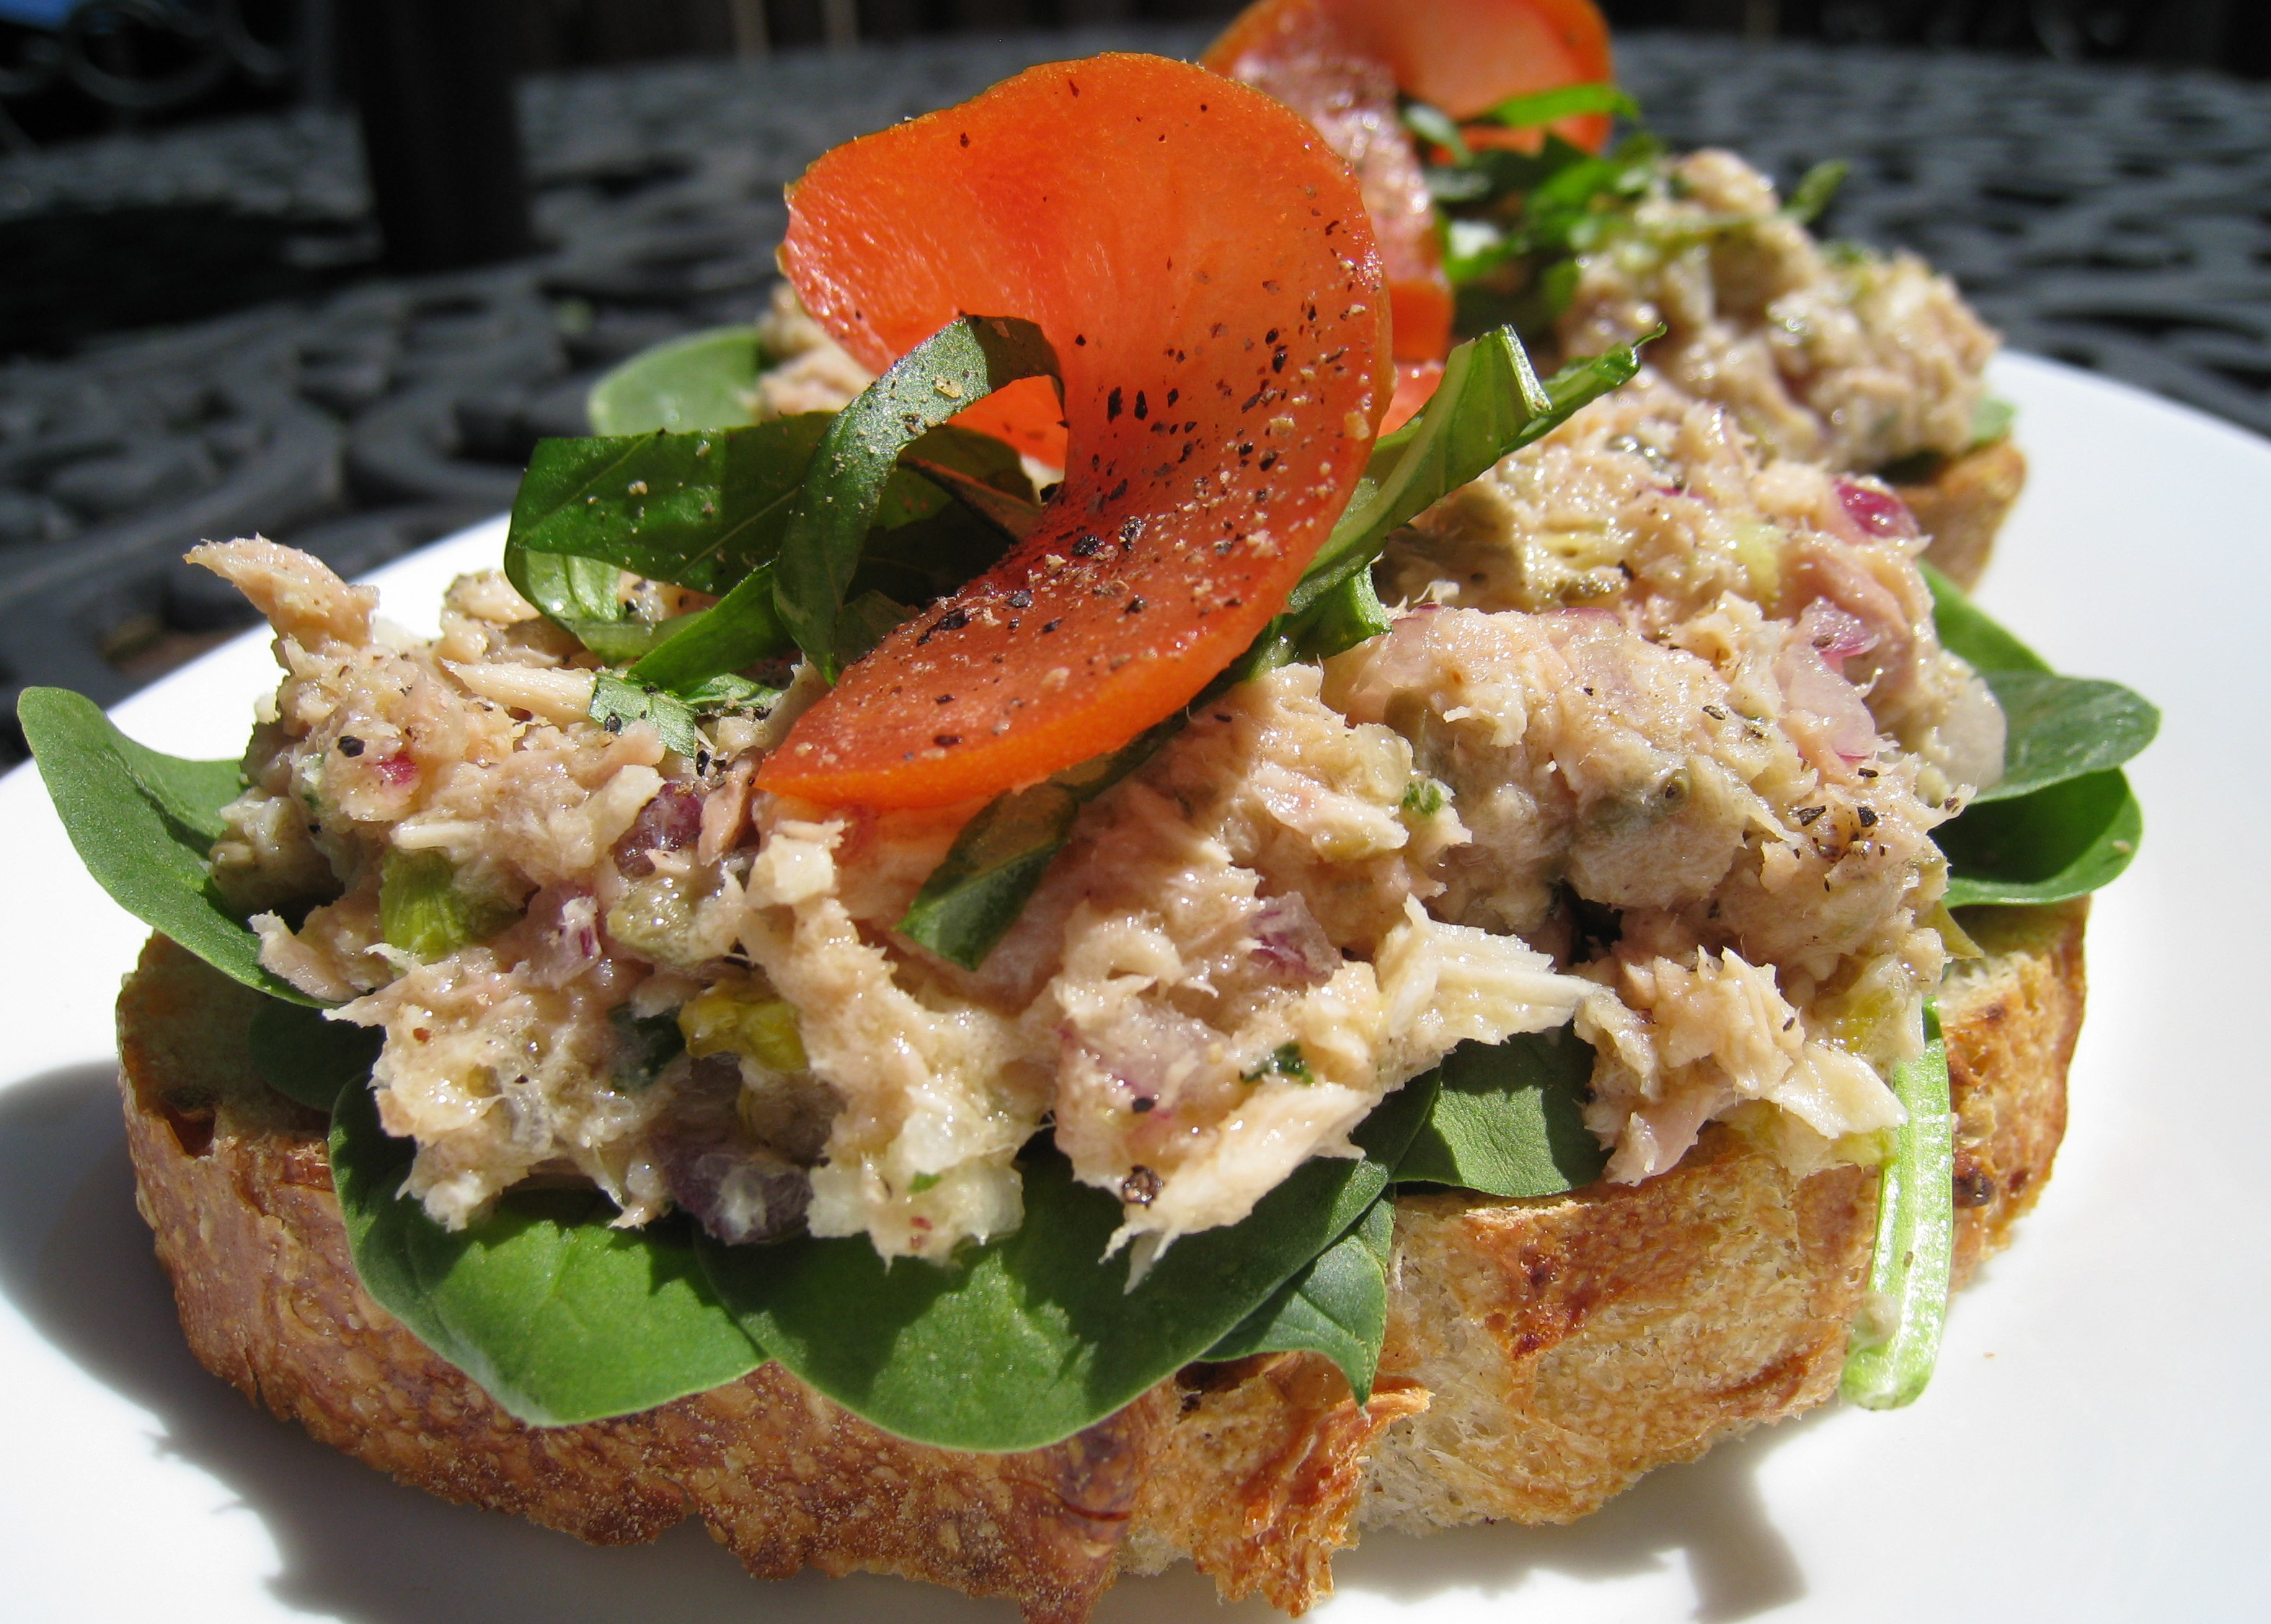 Mediterranean Tuna Salad | Tasty Kitchen: A Happy Recipe Community!